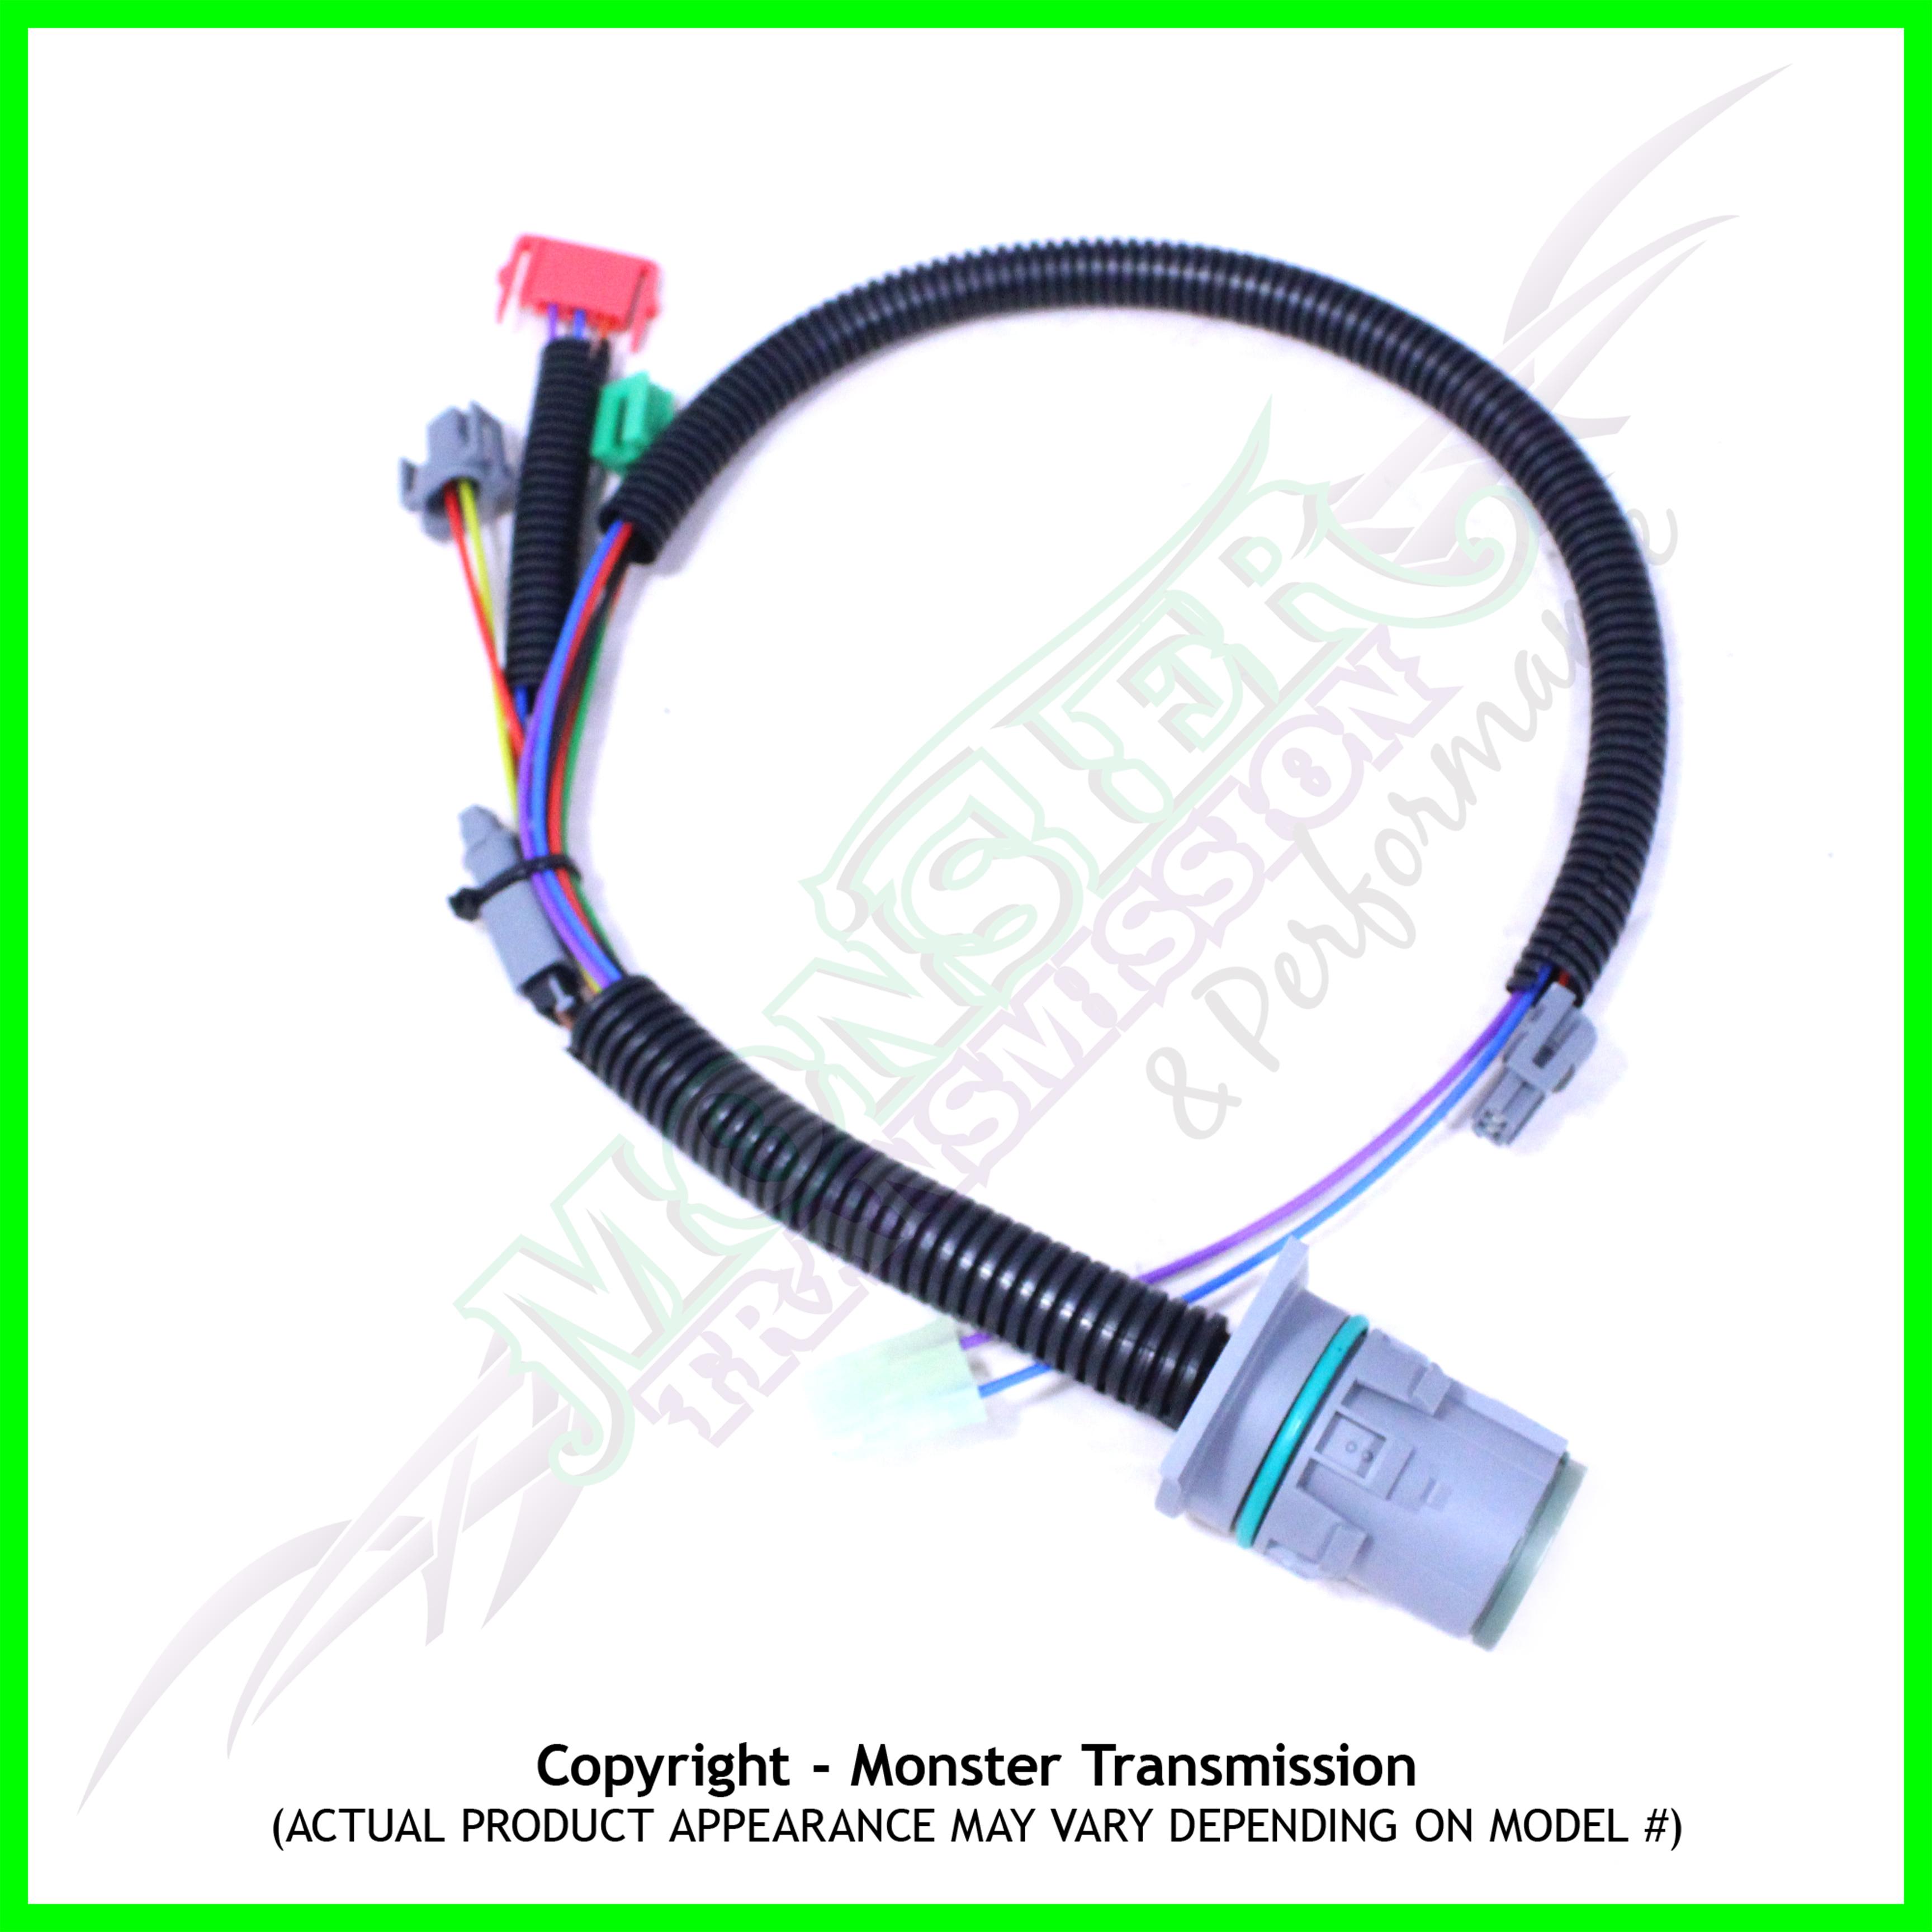 gm chevrolet wire harness internal repair exc jaguar 94 03 close